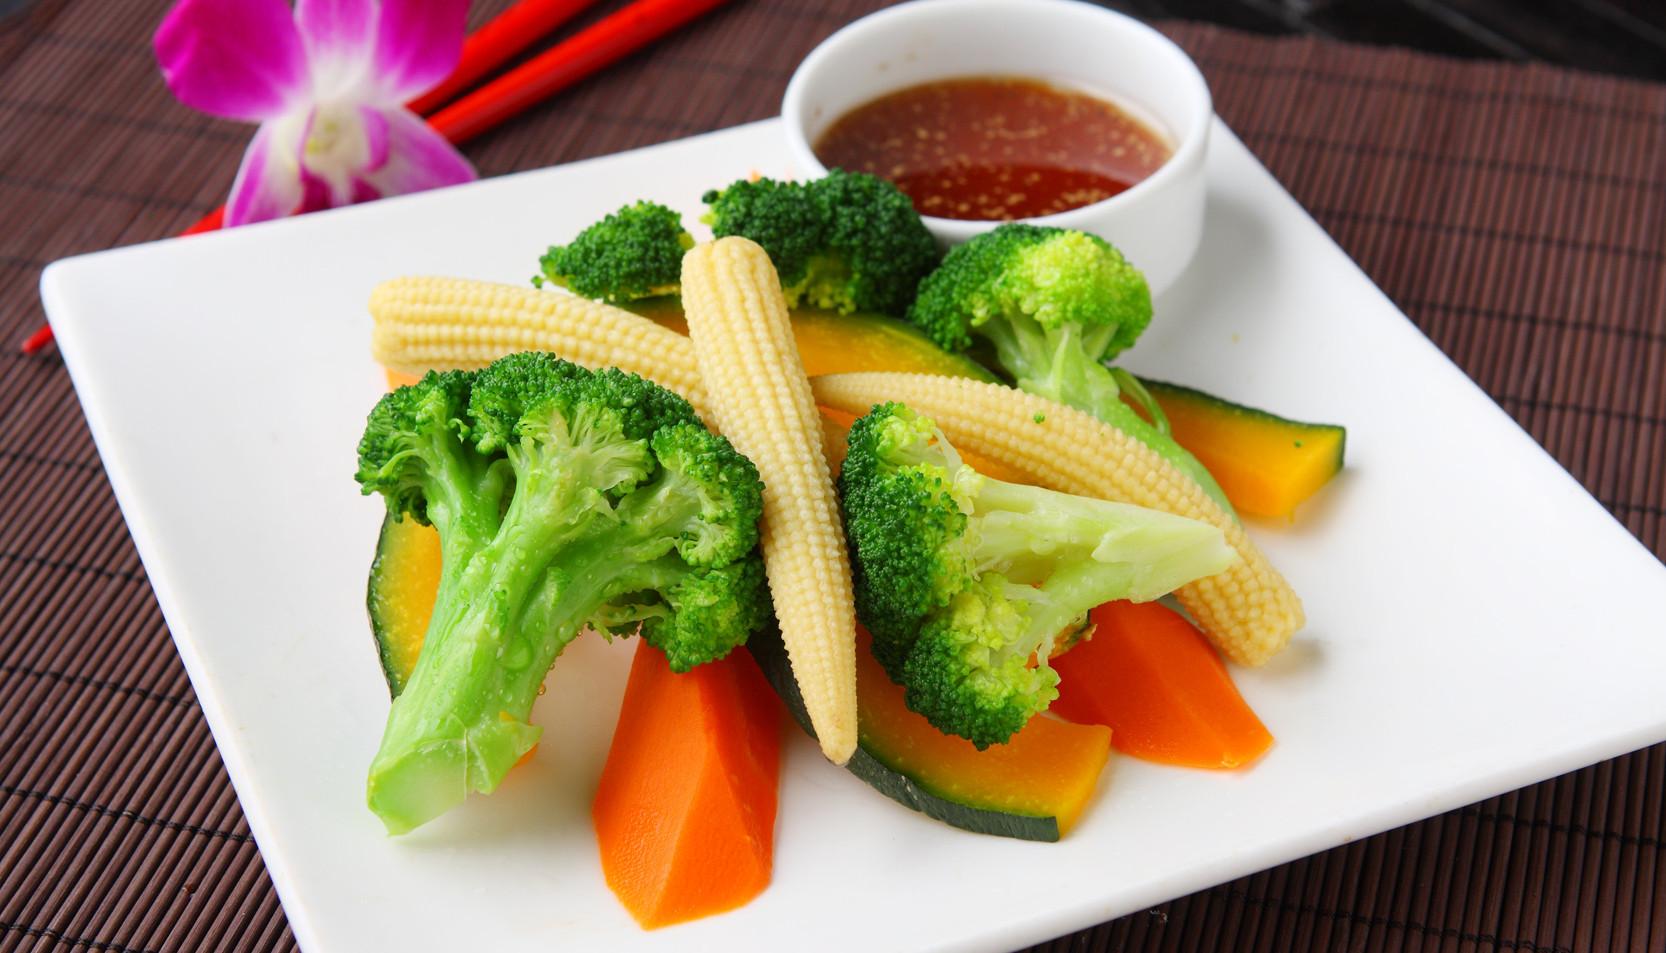 C6 steamed vegetable.jpg